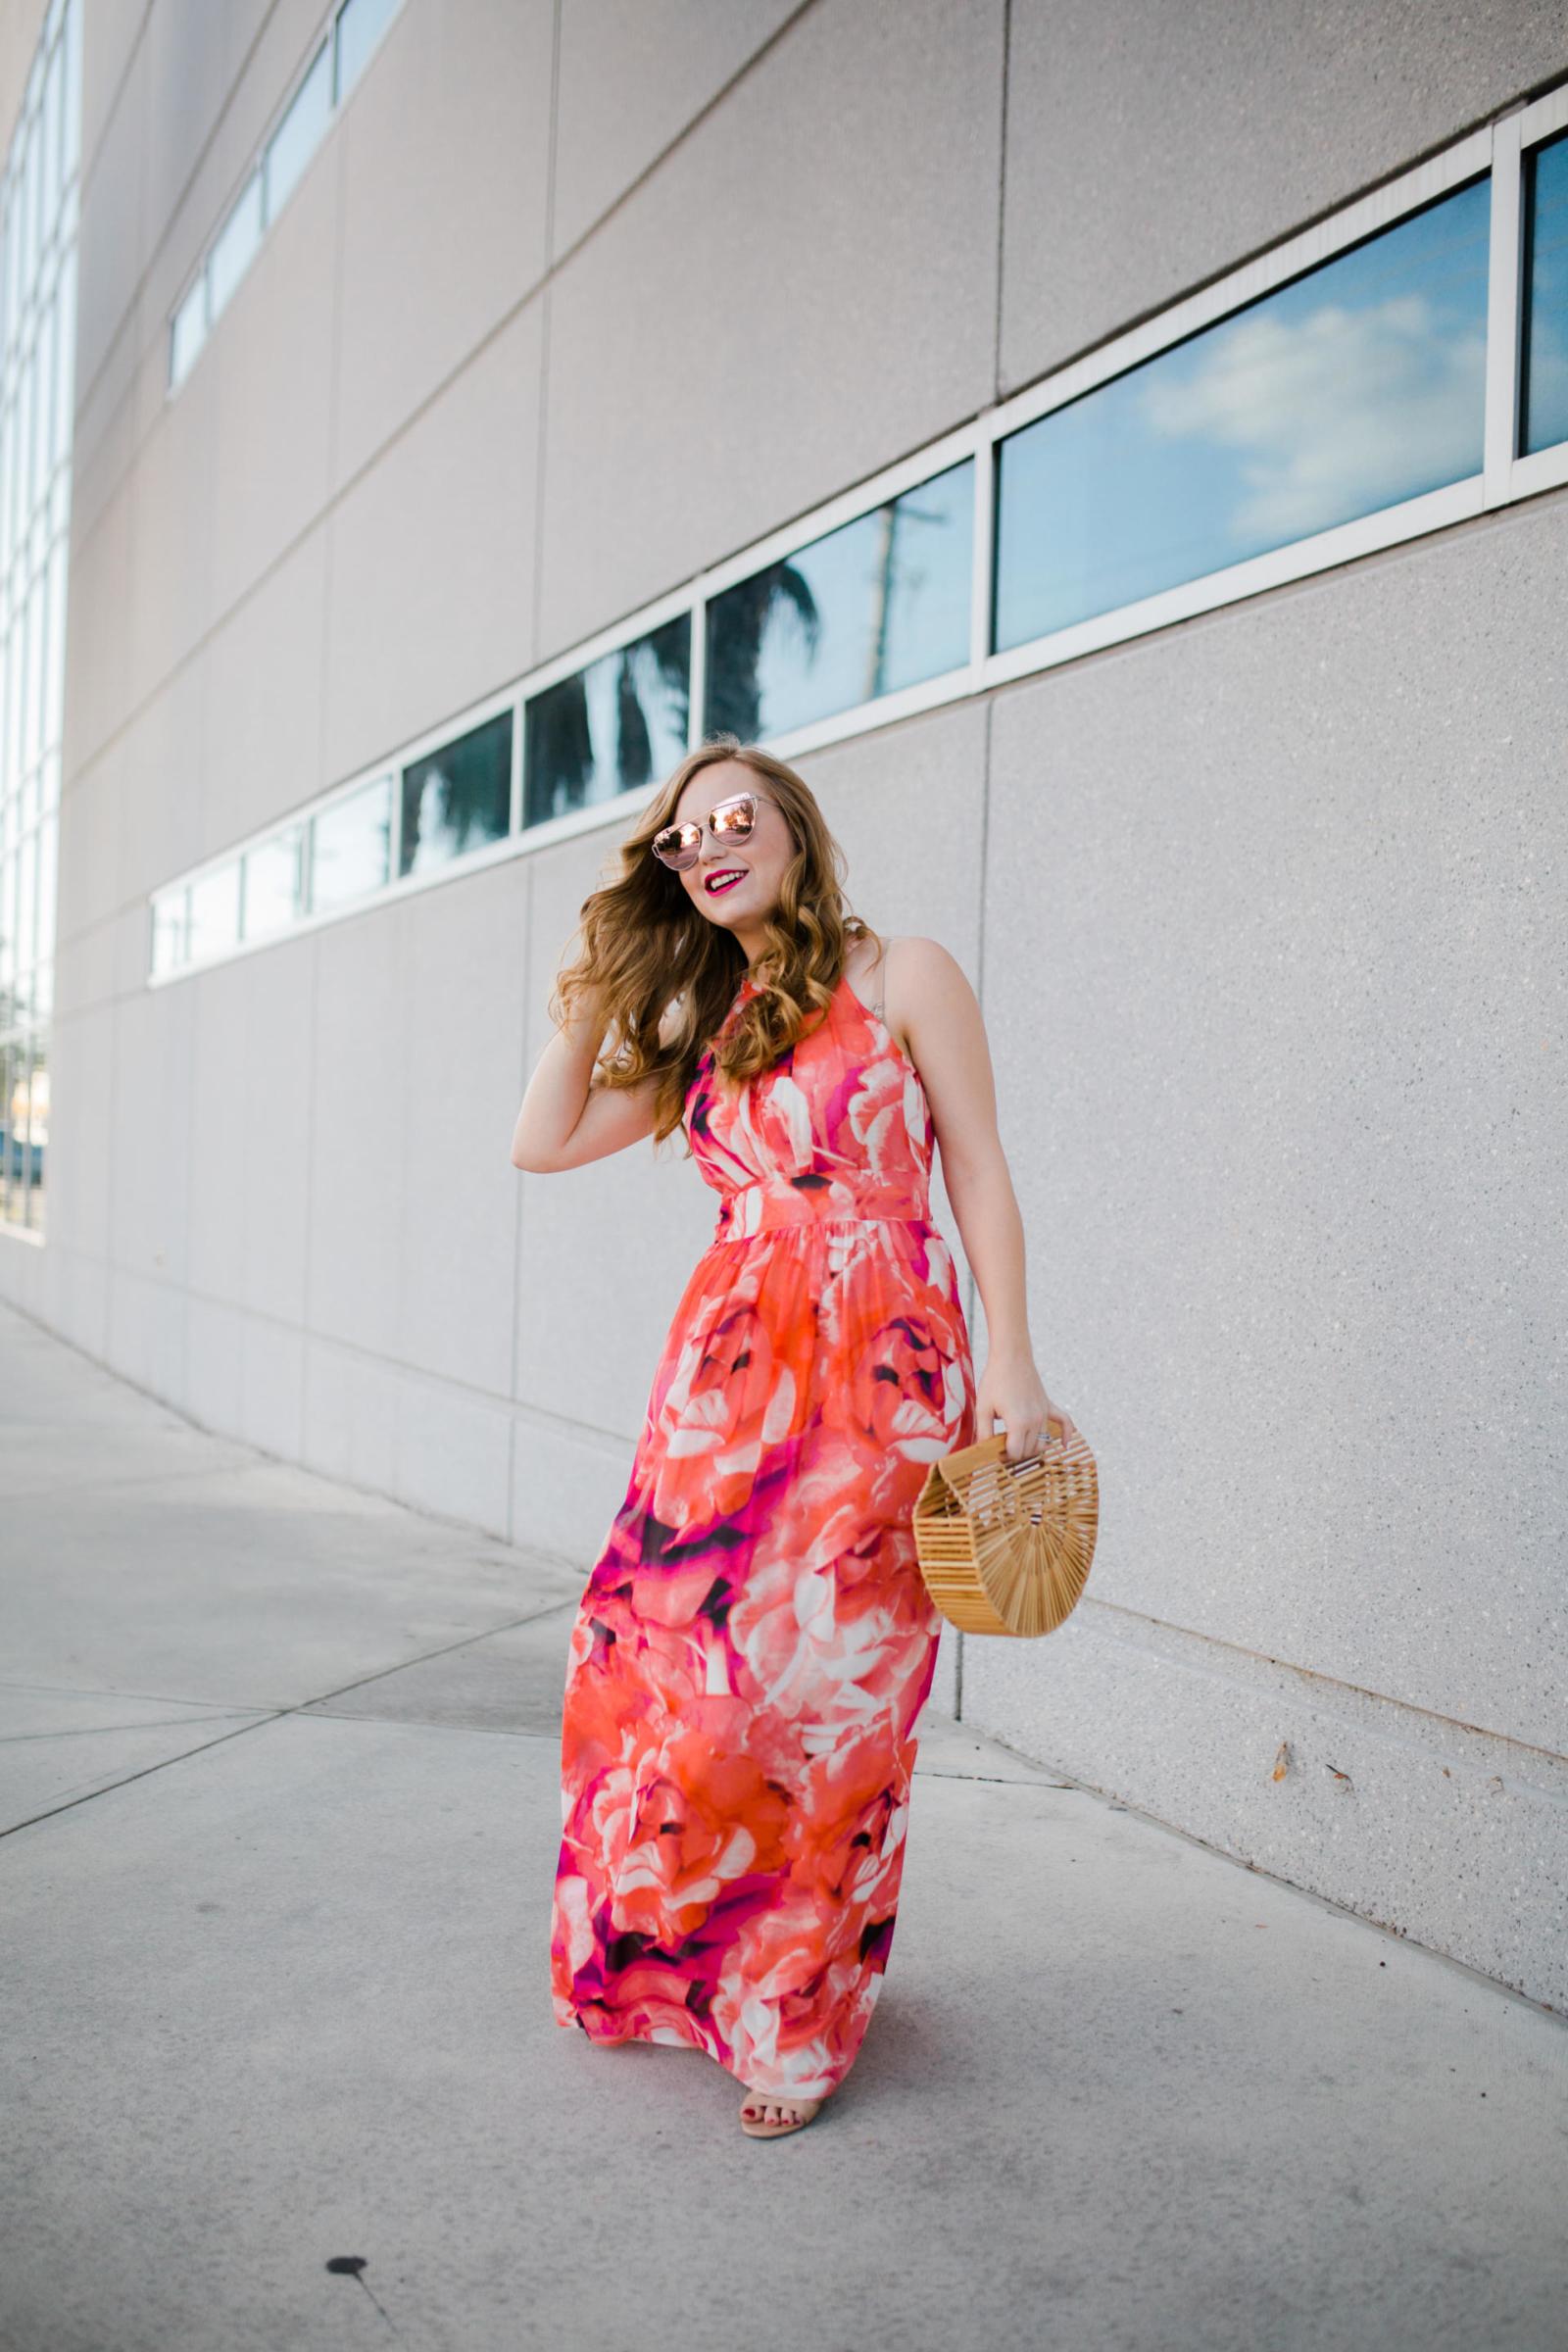 Florida Floral Maxi Dress Vacation Outfit Inspiration